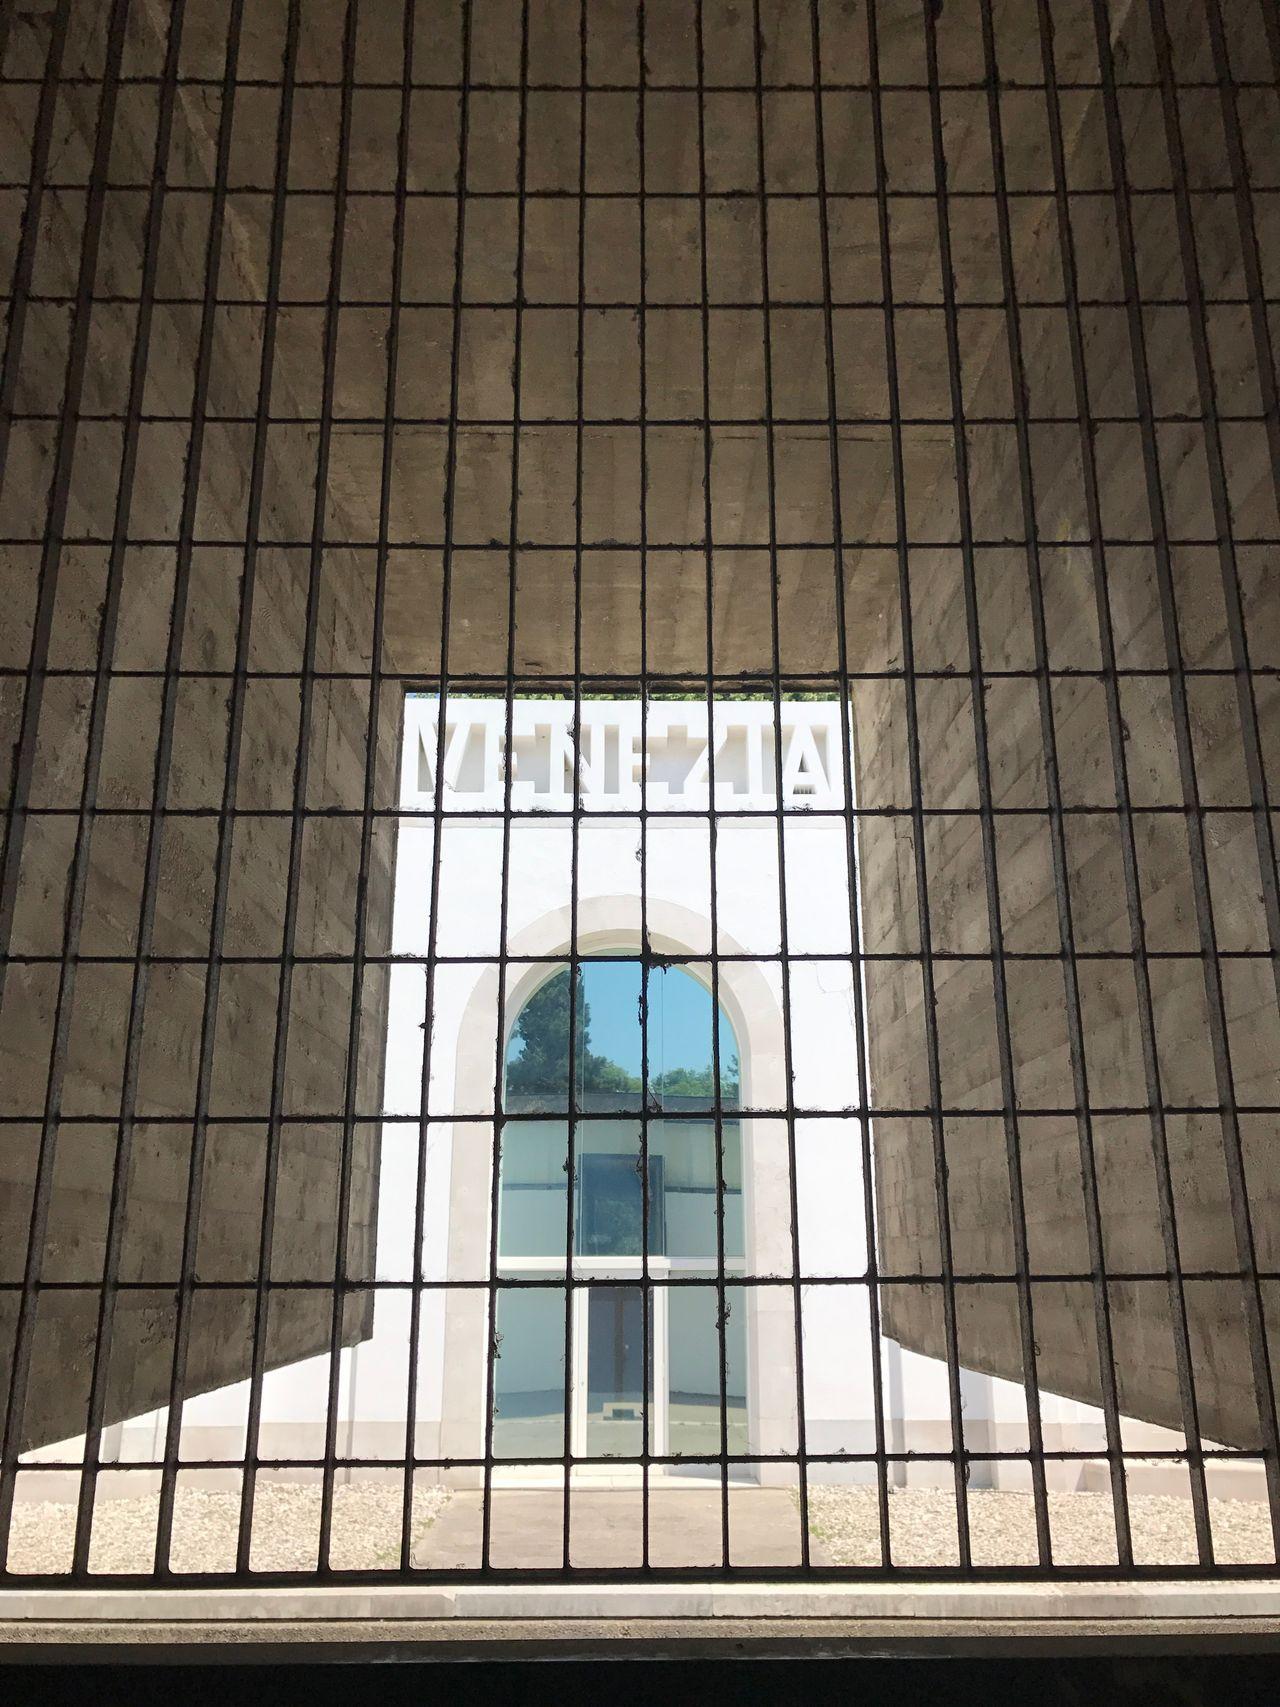 Window Architecture Built Structure No People Day Building Exterior Outdoors Biennale Di Venezia 2017